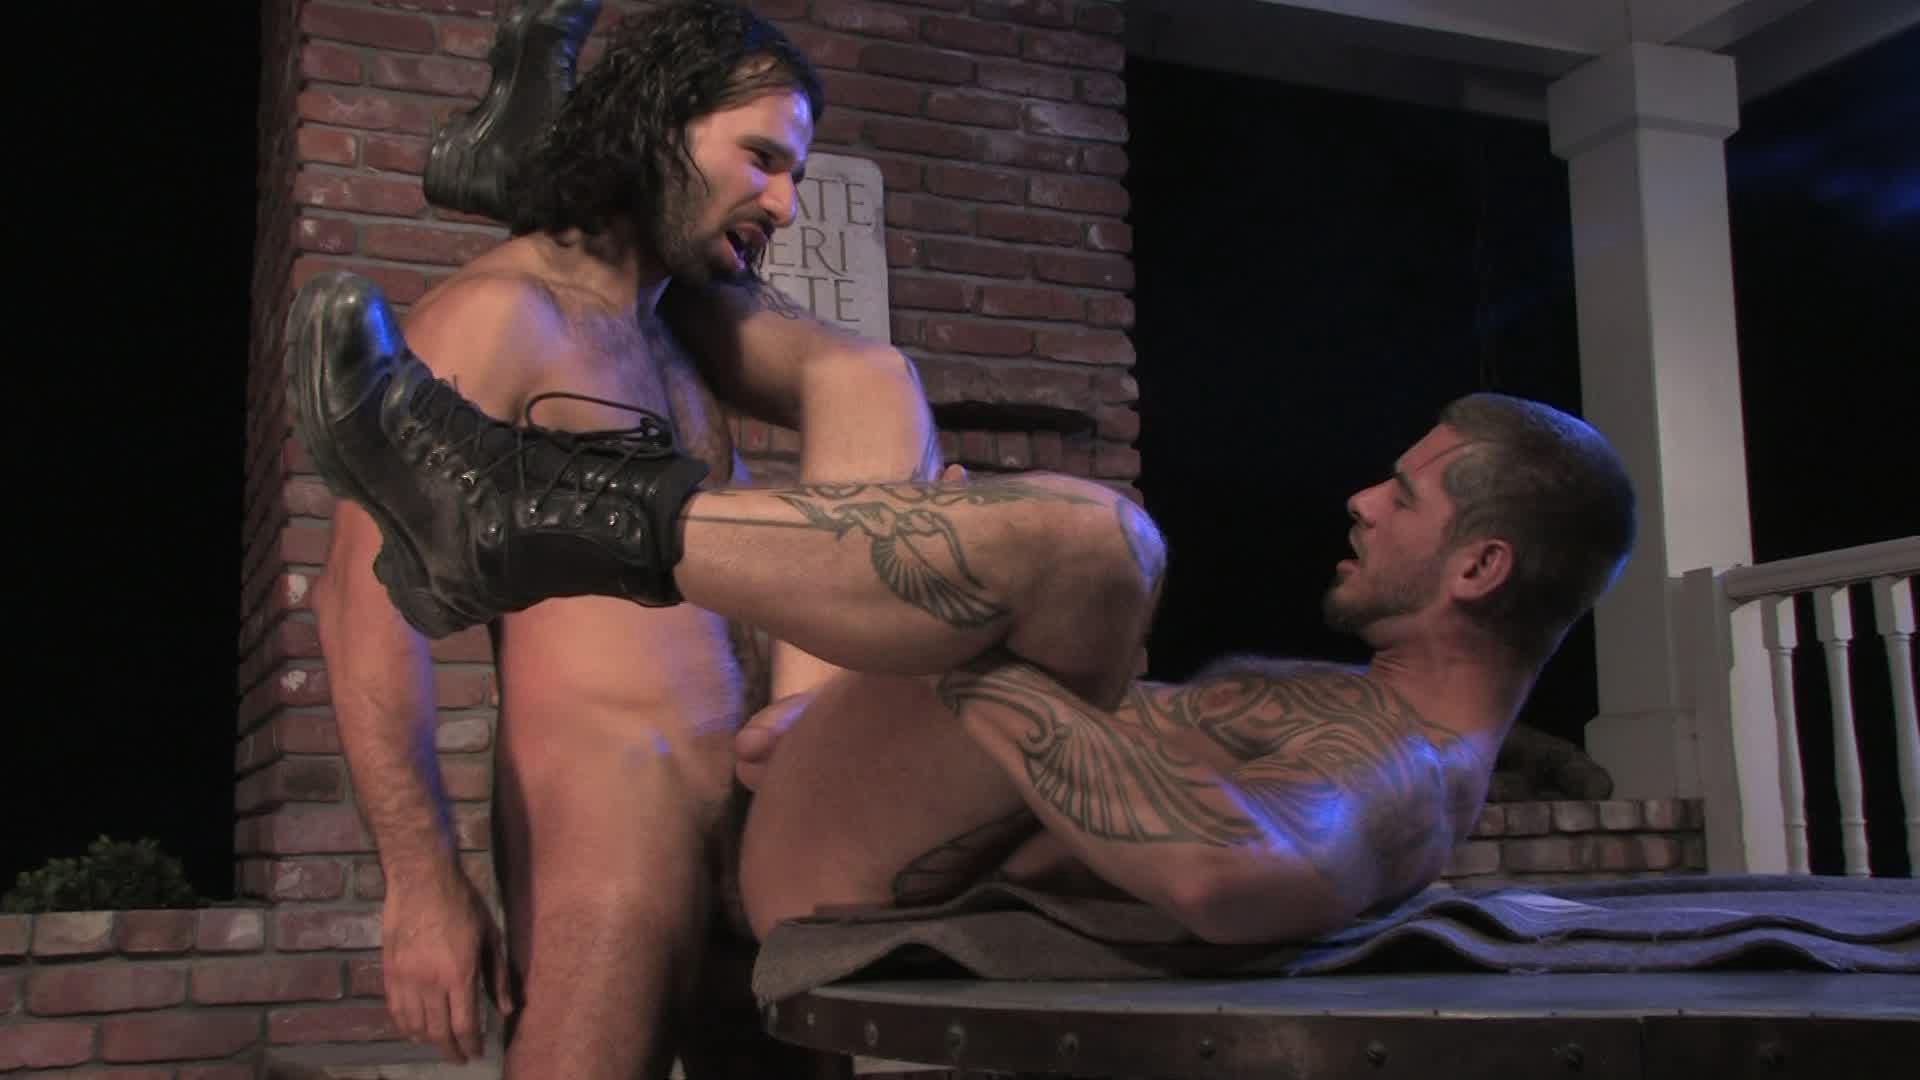 Aybars Porn Twitter aybars, damien crosse - gay - giants looking ripe and sweaty,